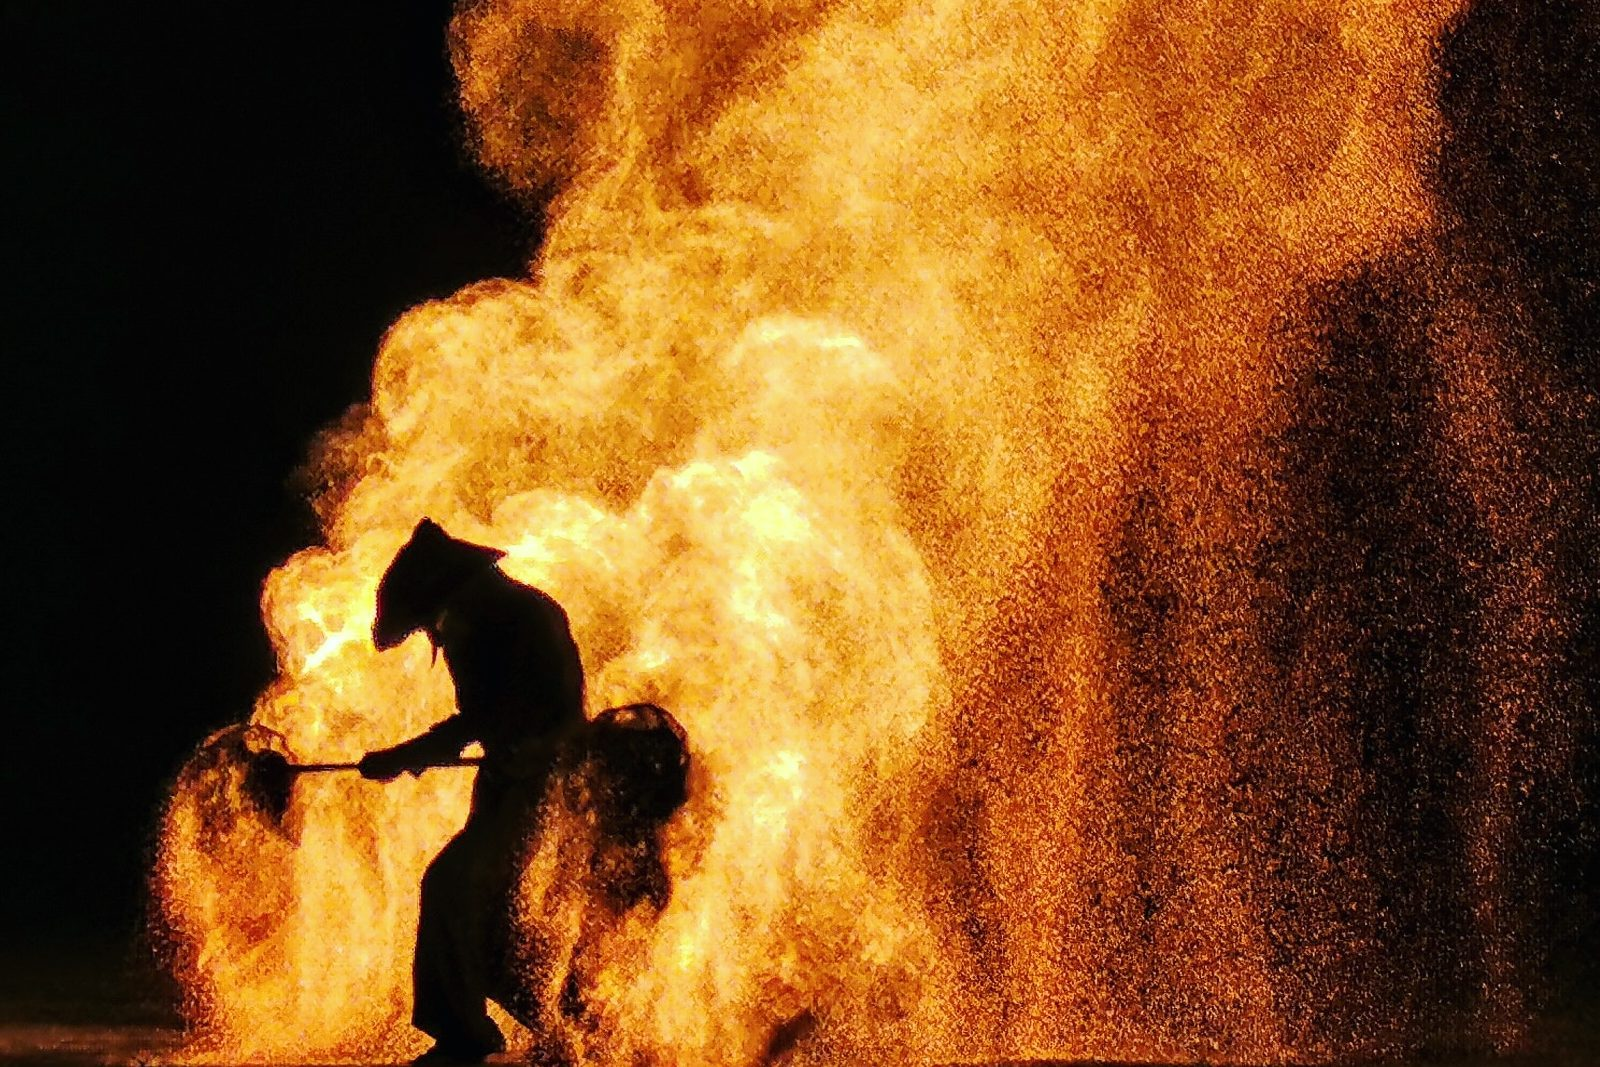 spectacle de feu,jongleurs de feu, compagnie belizama, cracheurs de feu, spectacle de rue, spectacle de feu bretagne, spectacle pyrotechnique, belizama,spectacle de rue